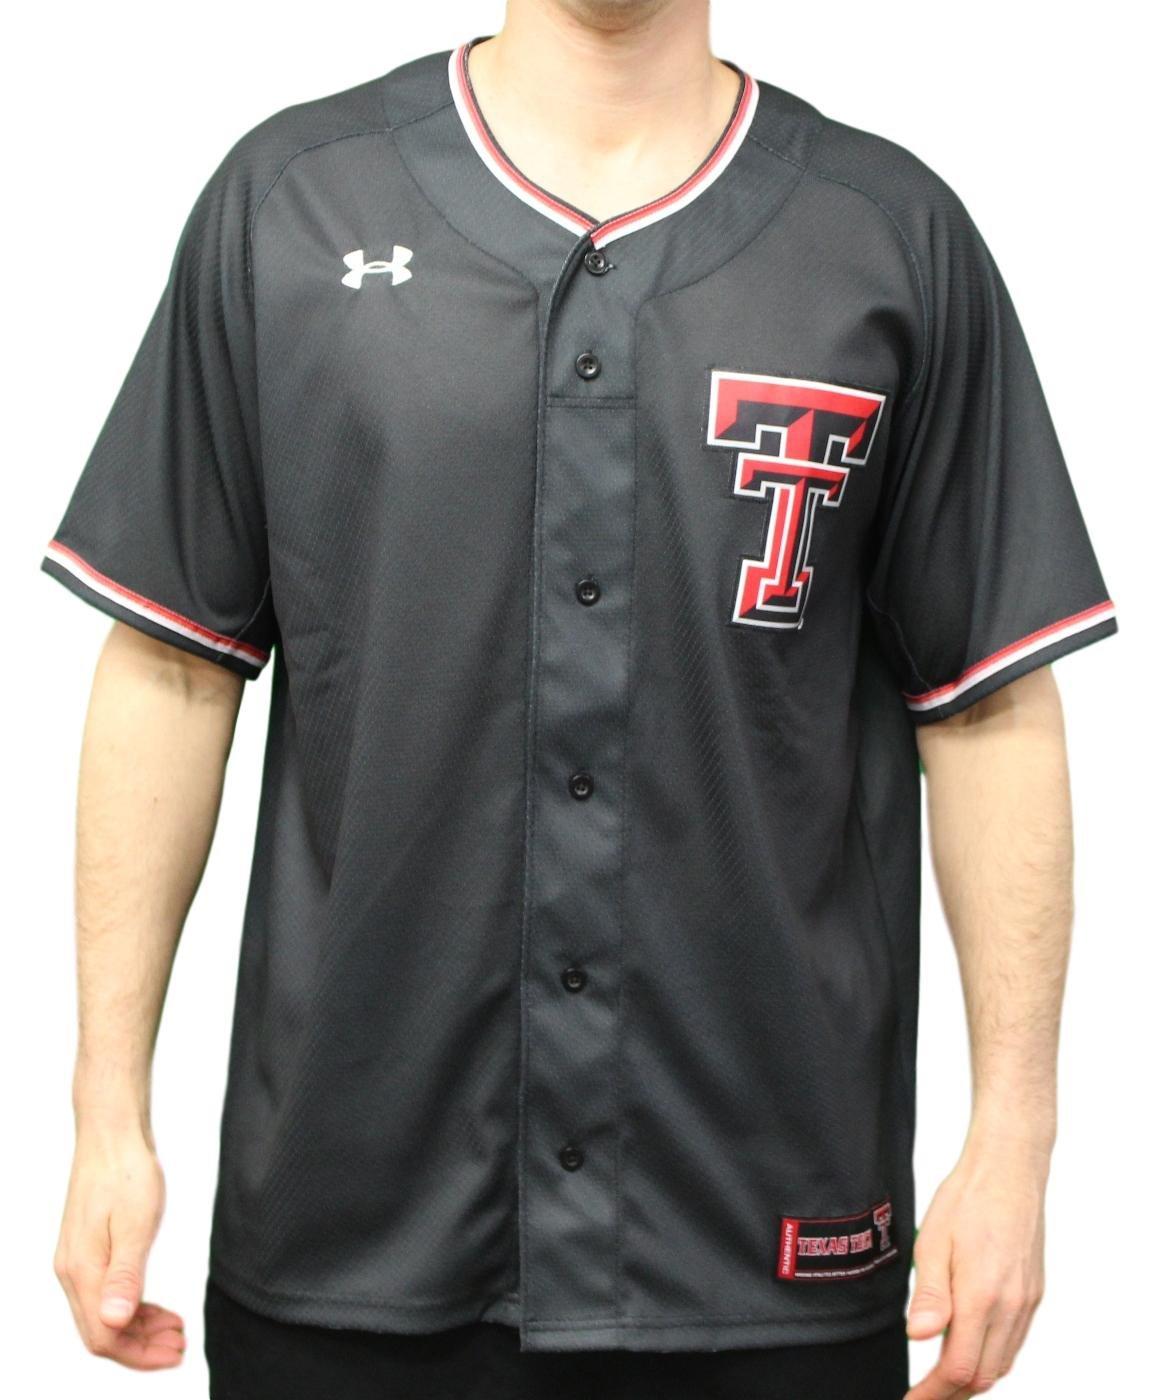 best website 001b2 9bcd3 Amazon.com : Under Armour Texas Tech Red Raiders NCAA Men's ...